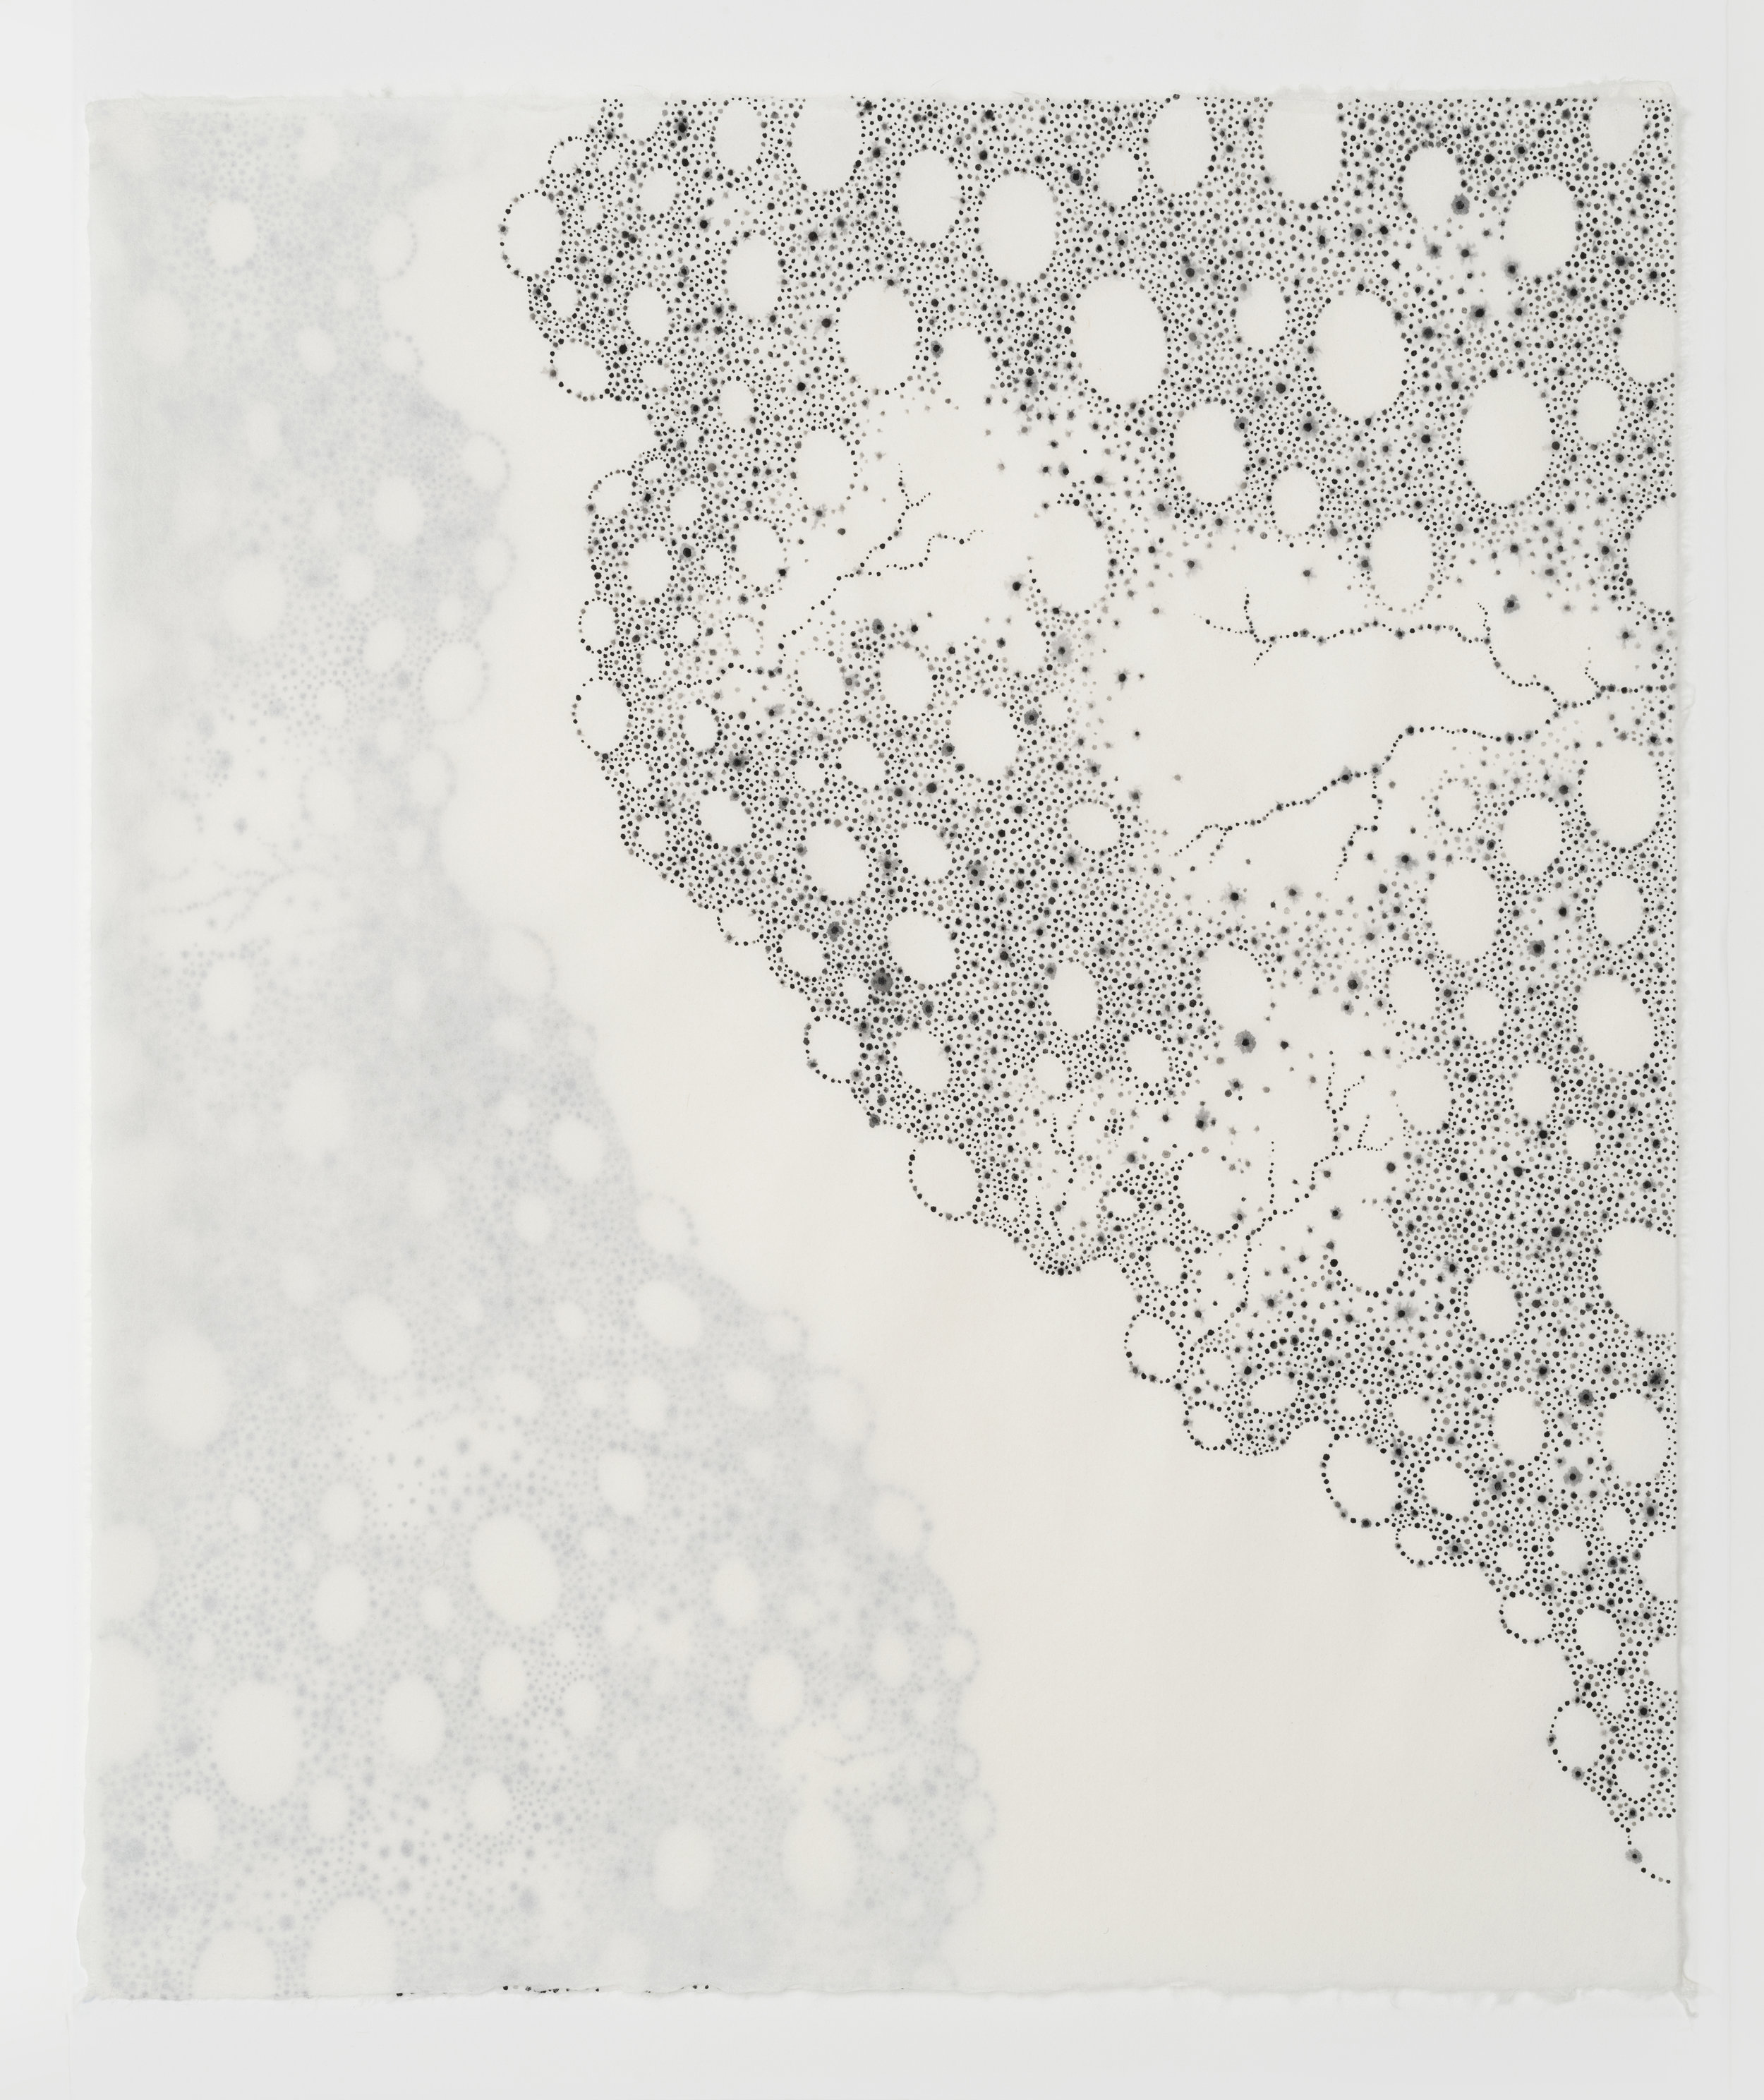 "Littoral Drift BK, egg tempera on layered hand made paper, 30""x28"", 2017"